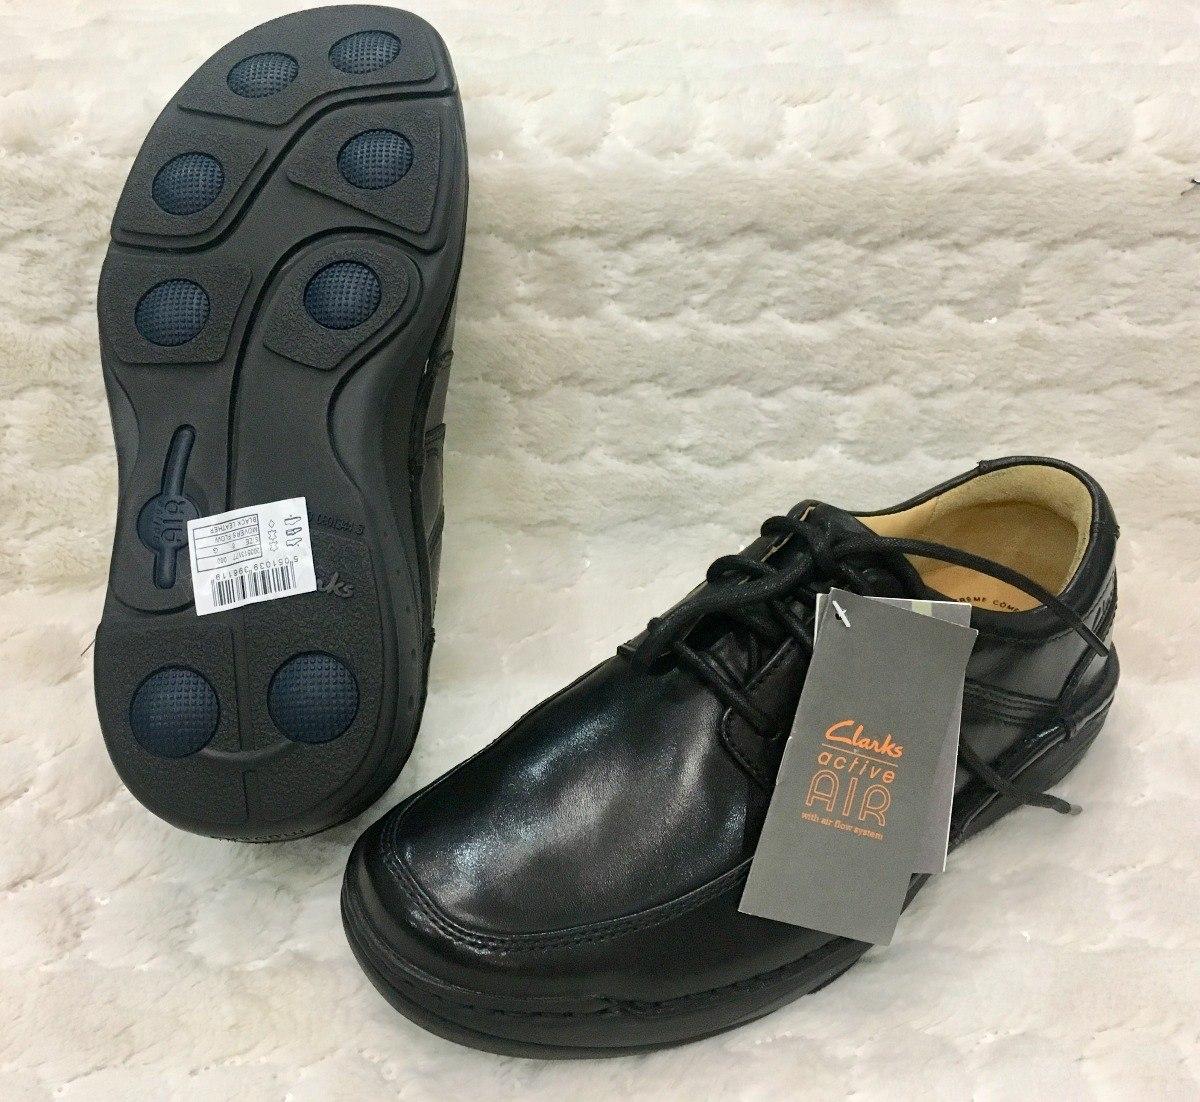 Zapatos Clarks Active Air Negro Orig. No.u.s. 6. Vzla 39.5